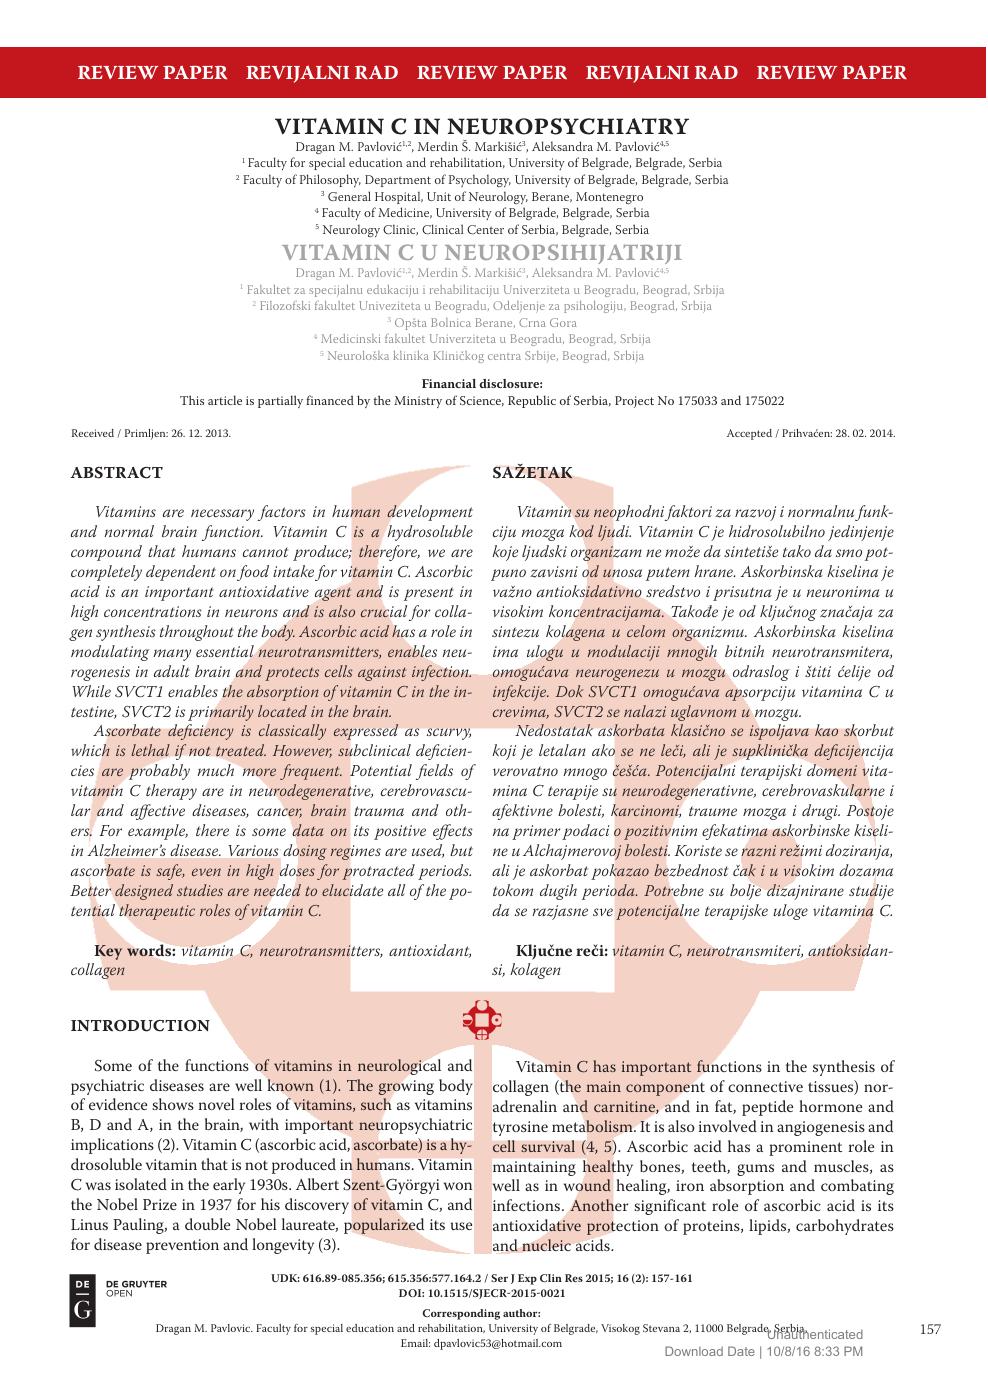 Vitamin C In Neuropsychiatry – topic of research paper in Clinical